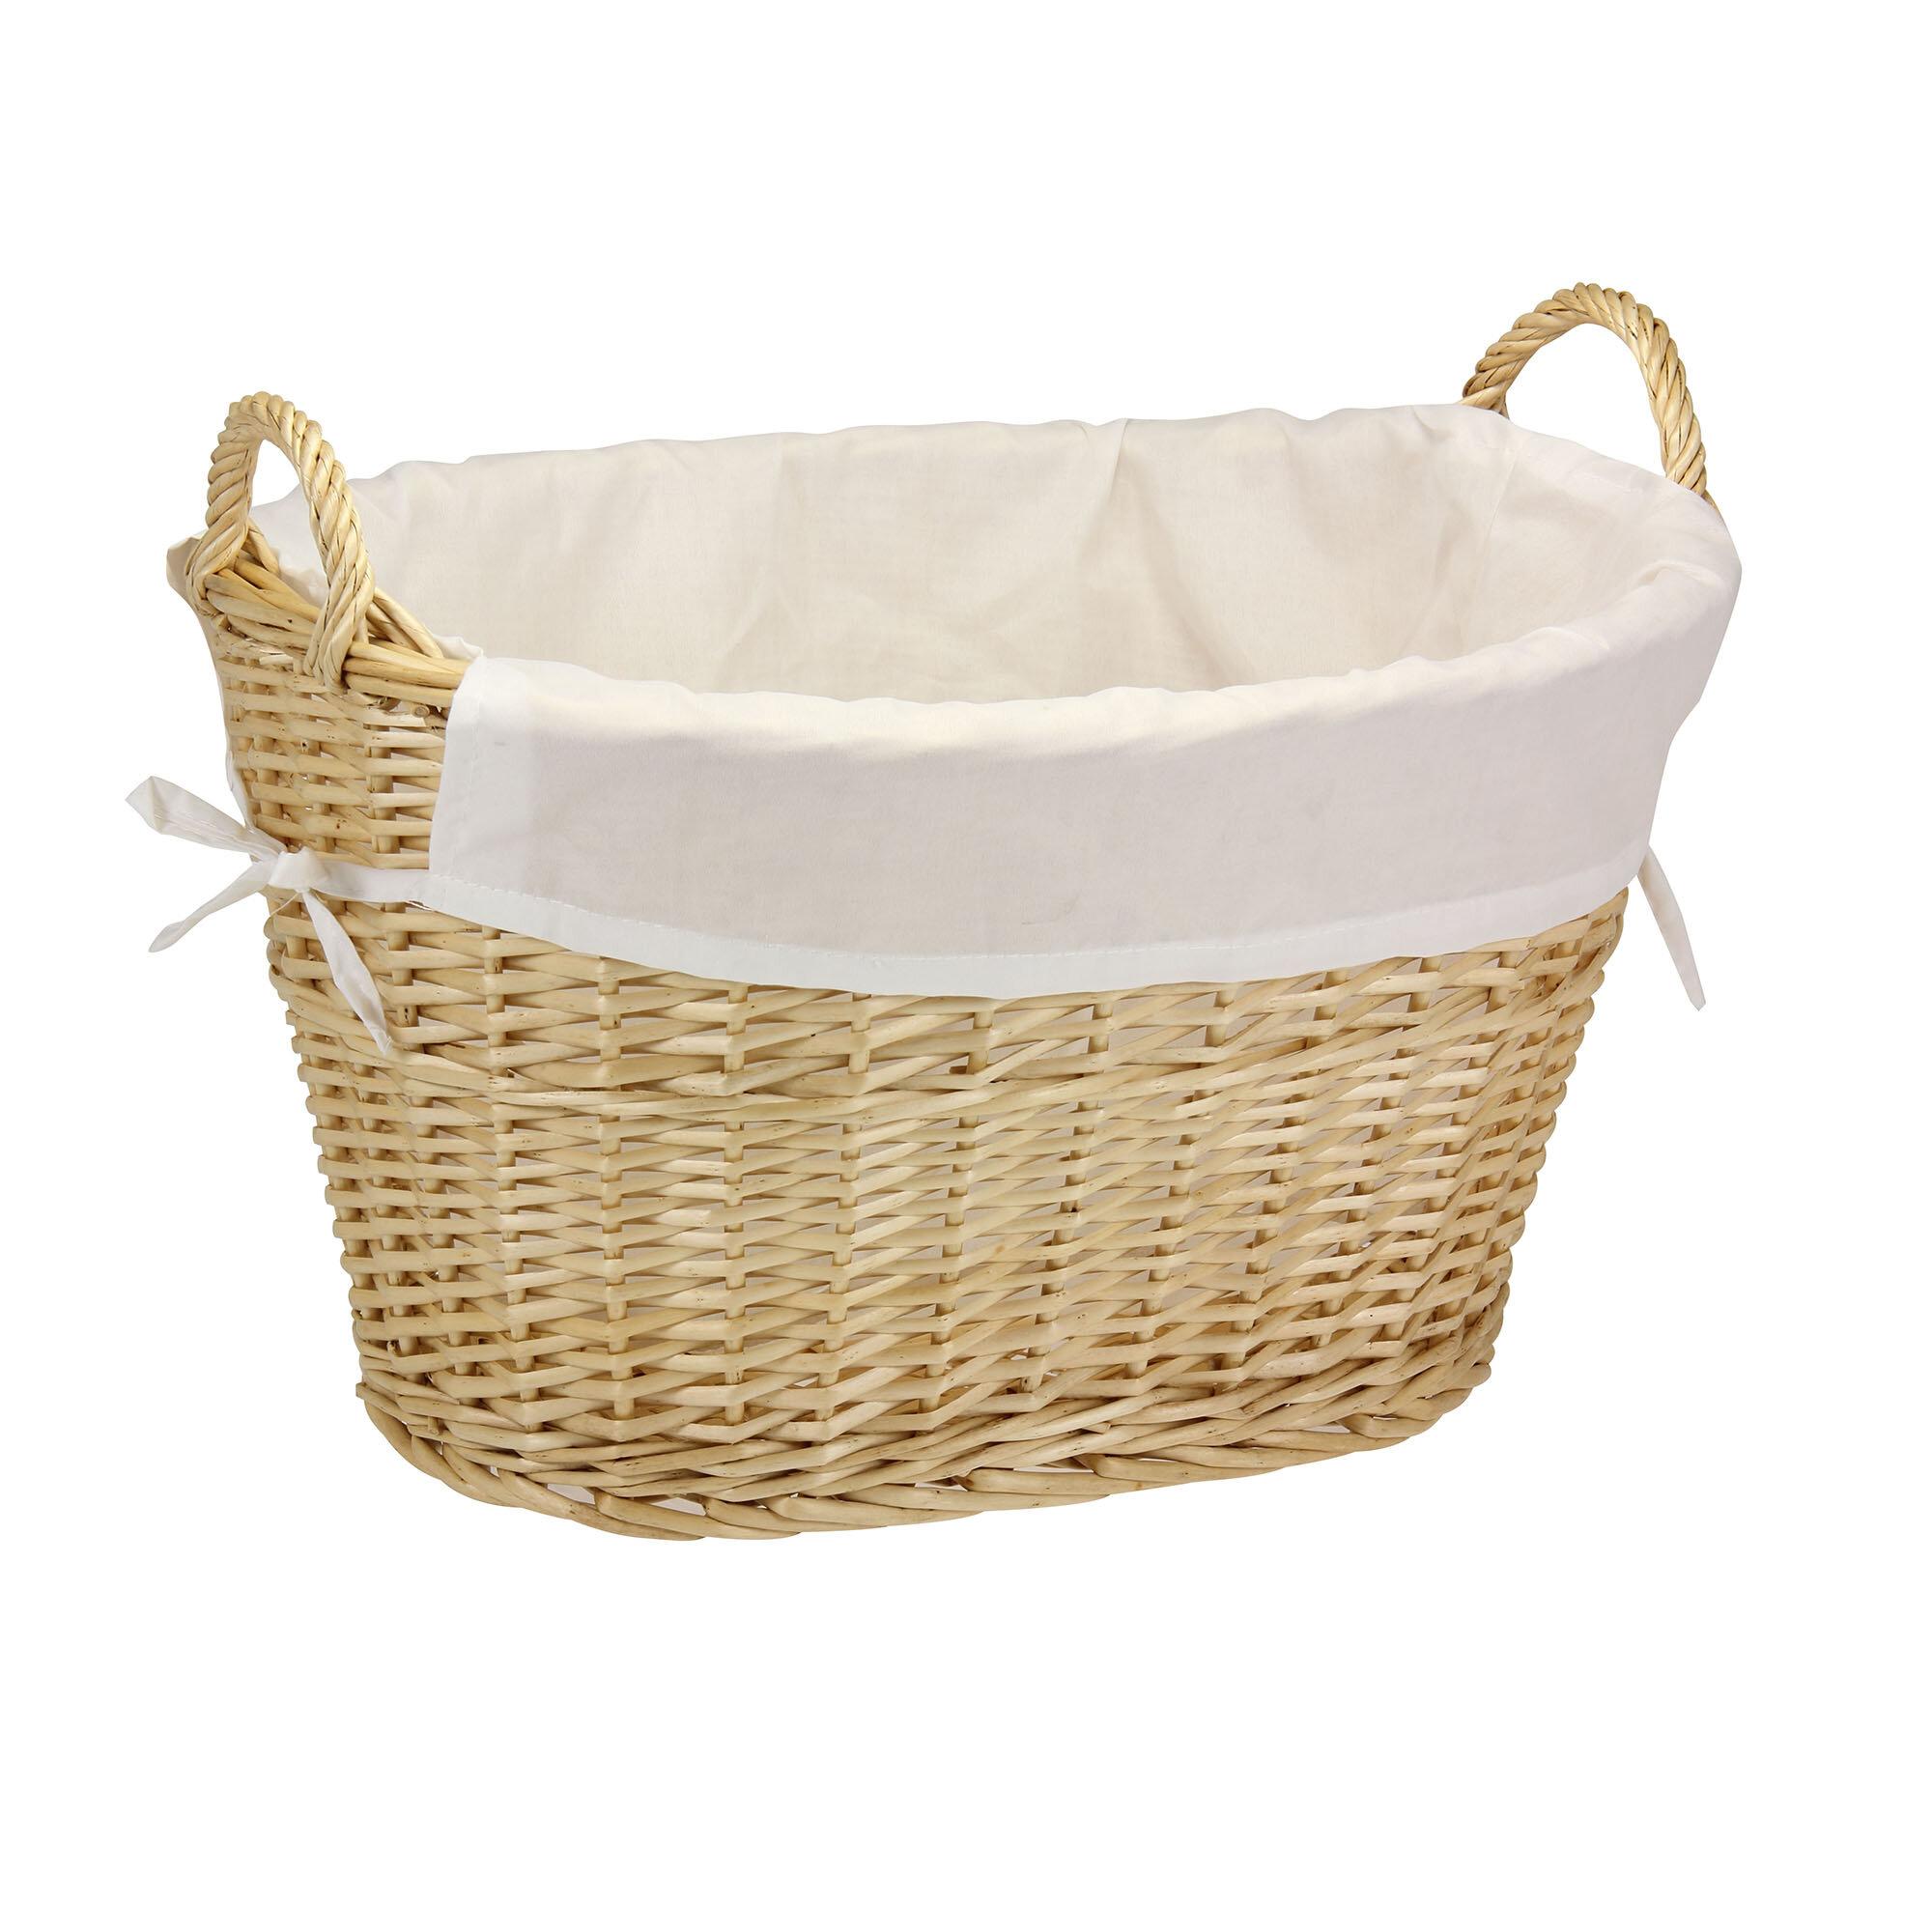 Beachcrest Home Wicker Laundry Basket & Reviews | Wayfair